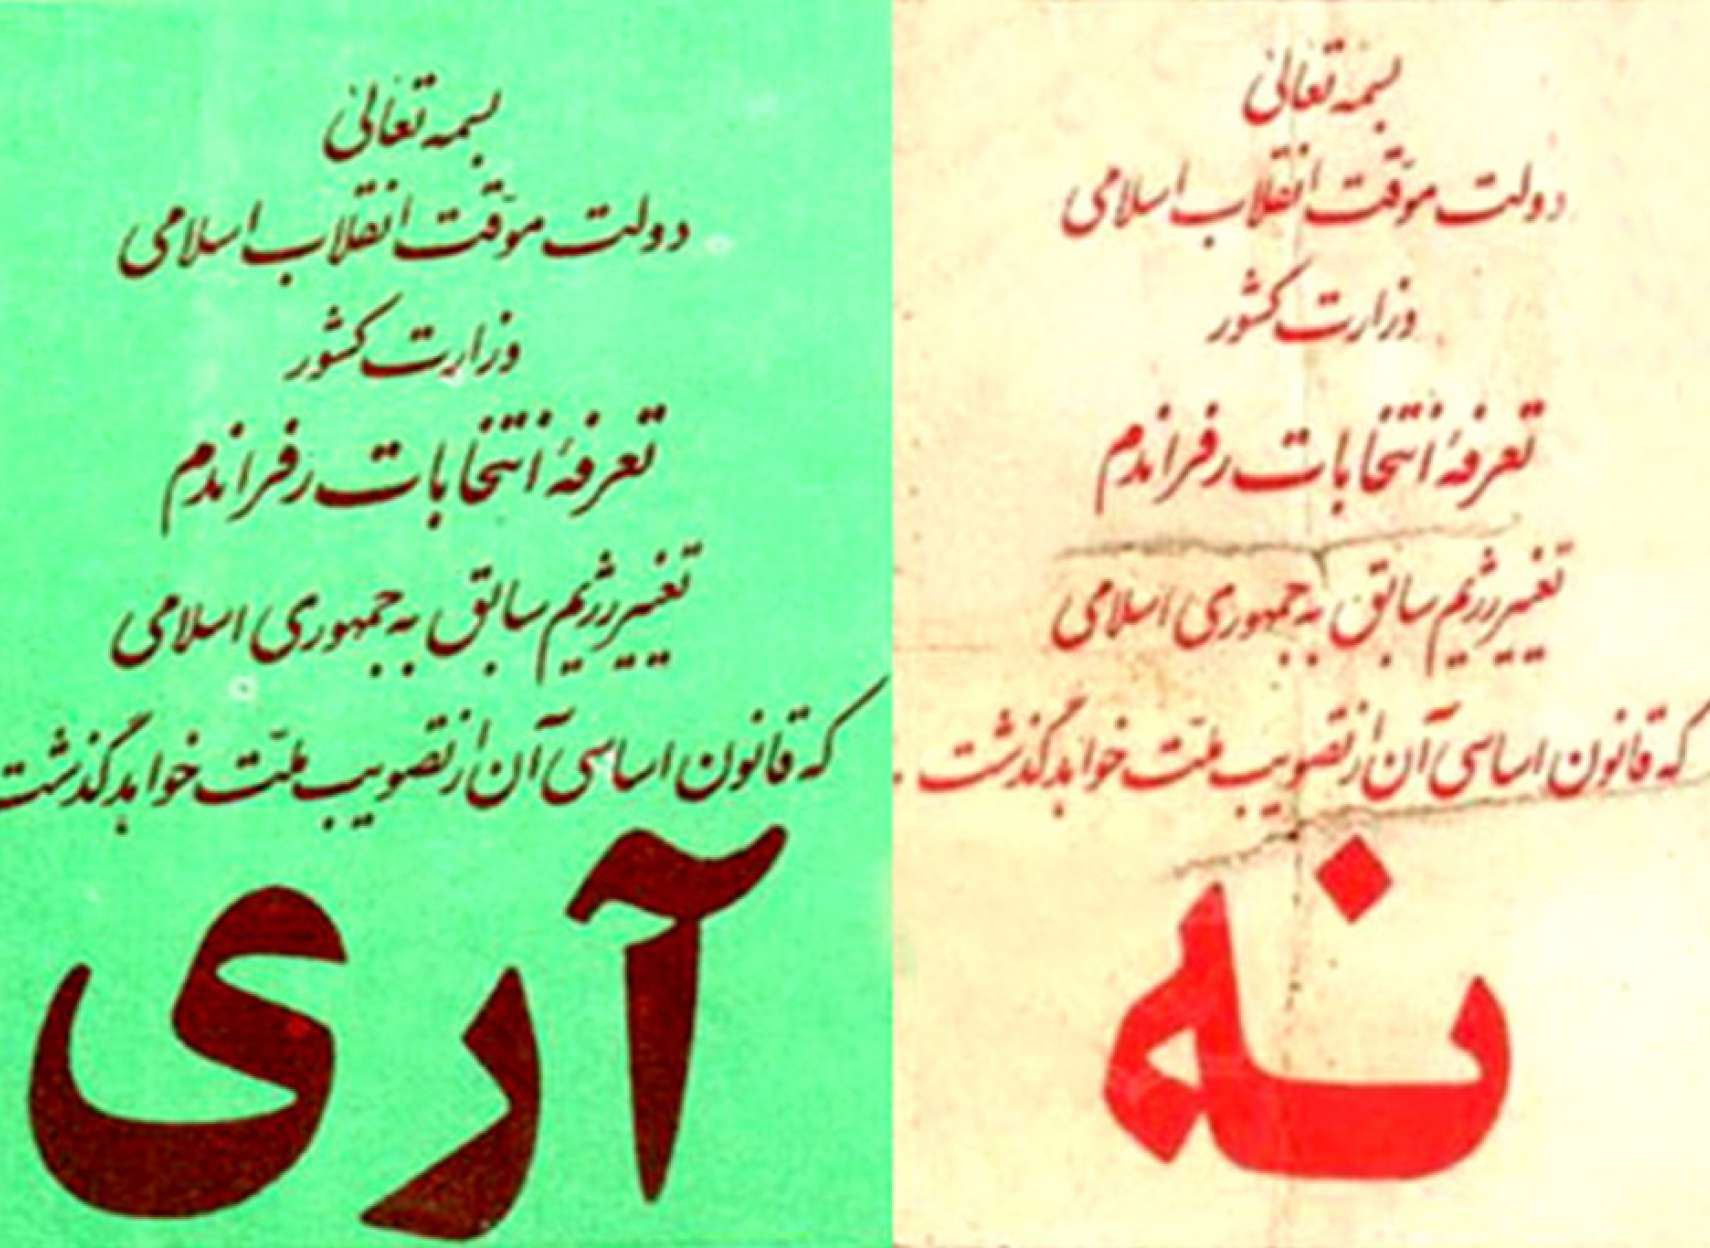 عمومی-ضیائیان-پیروزی-ضدِ-انقلابِ-ارتجاعیِ-اسلامی